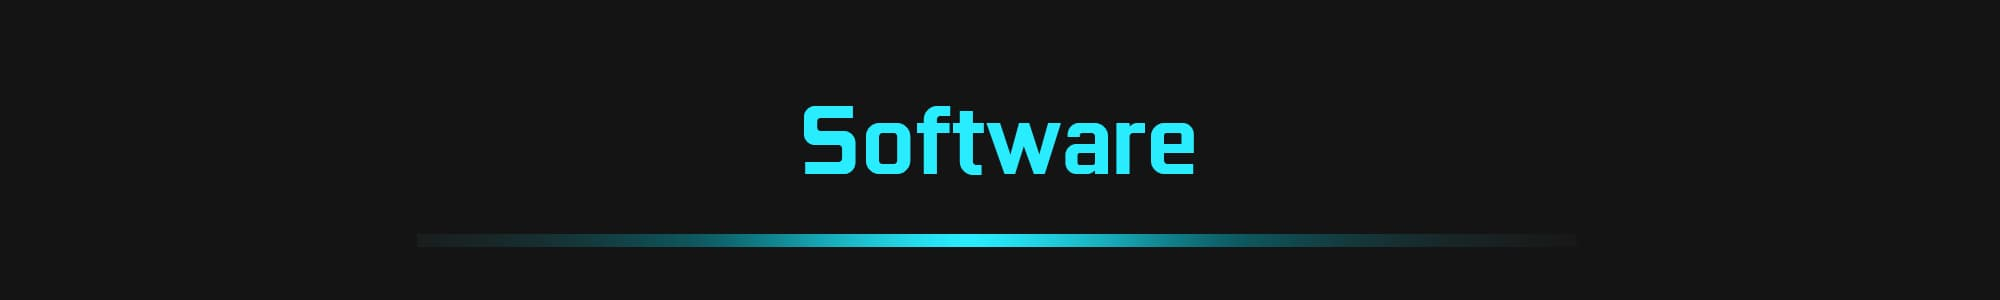 Softwaretitle